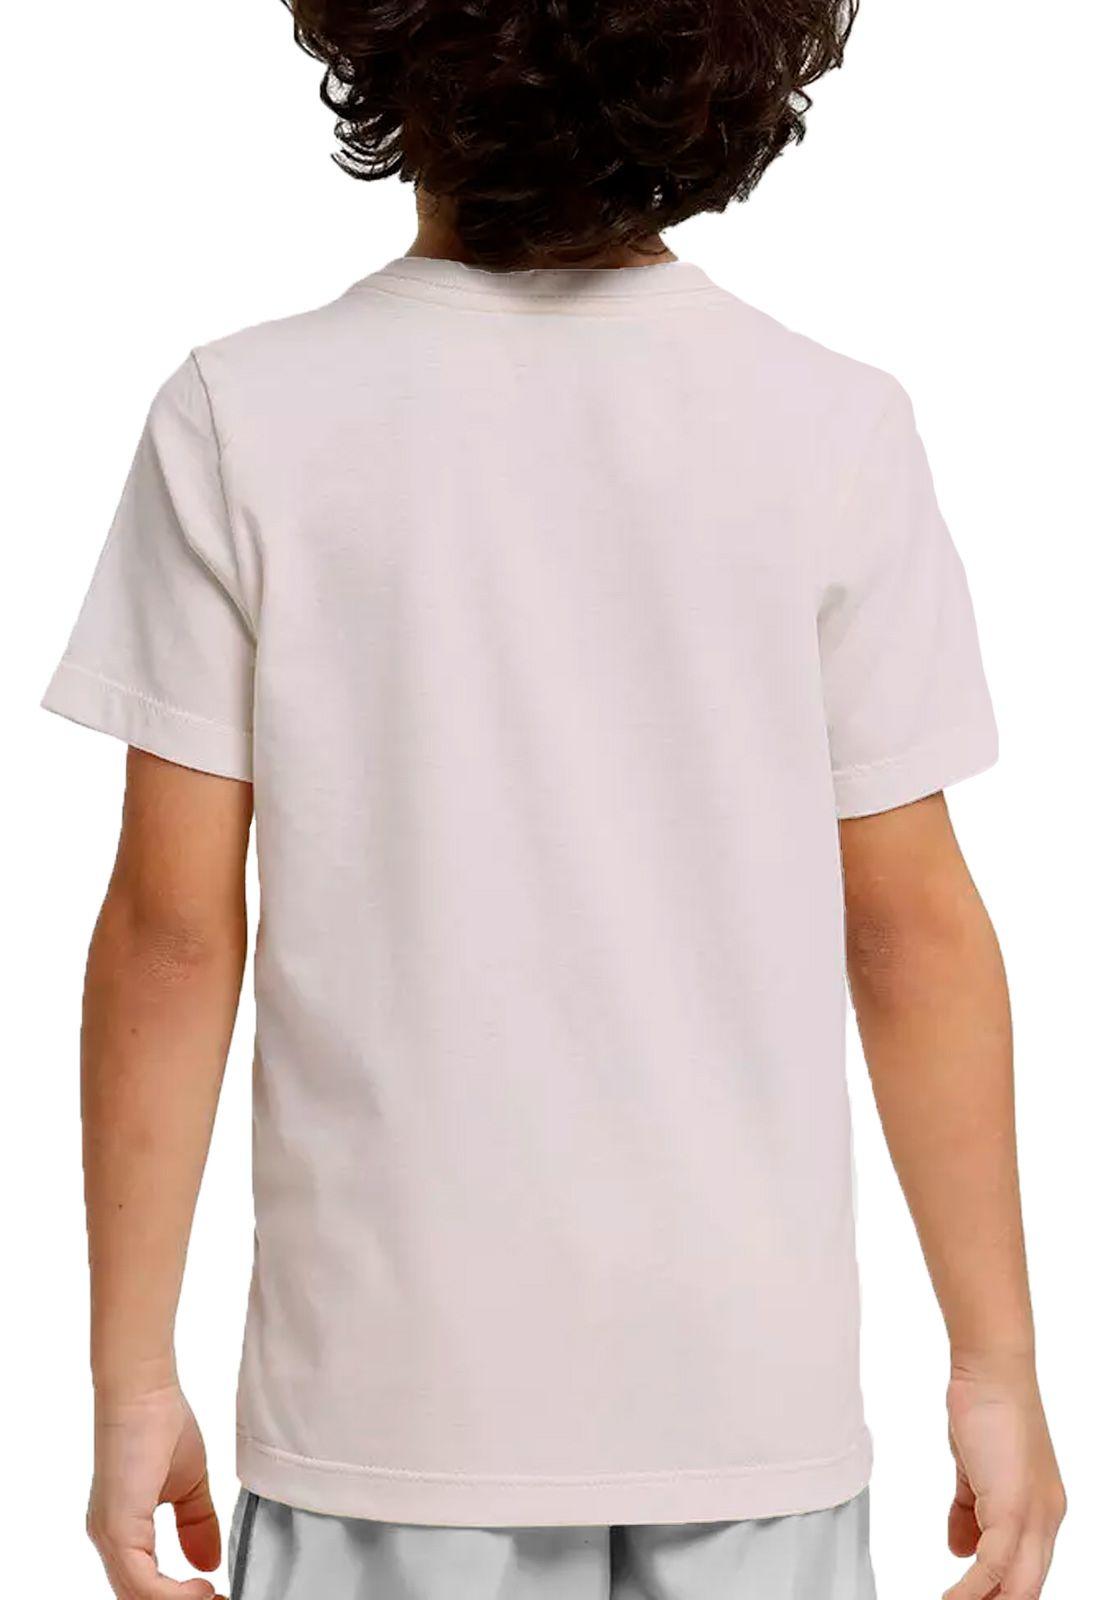 Camiseta Amazônia Adolescente Âncora - Lilás